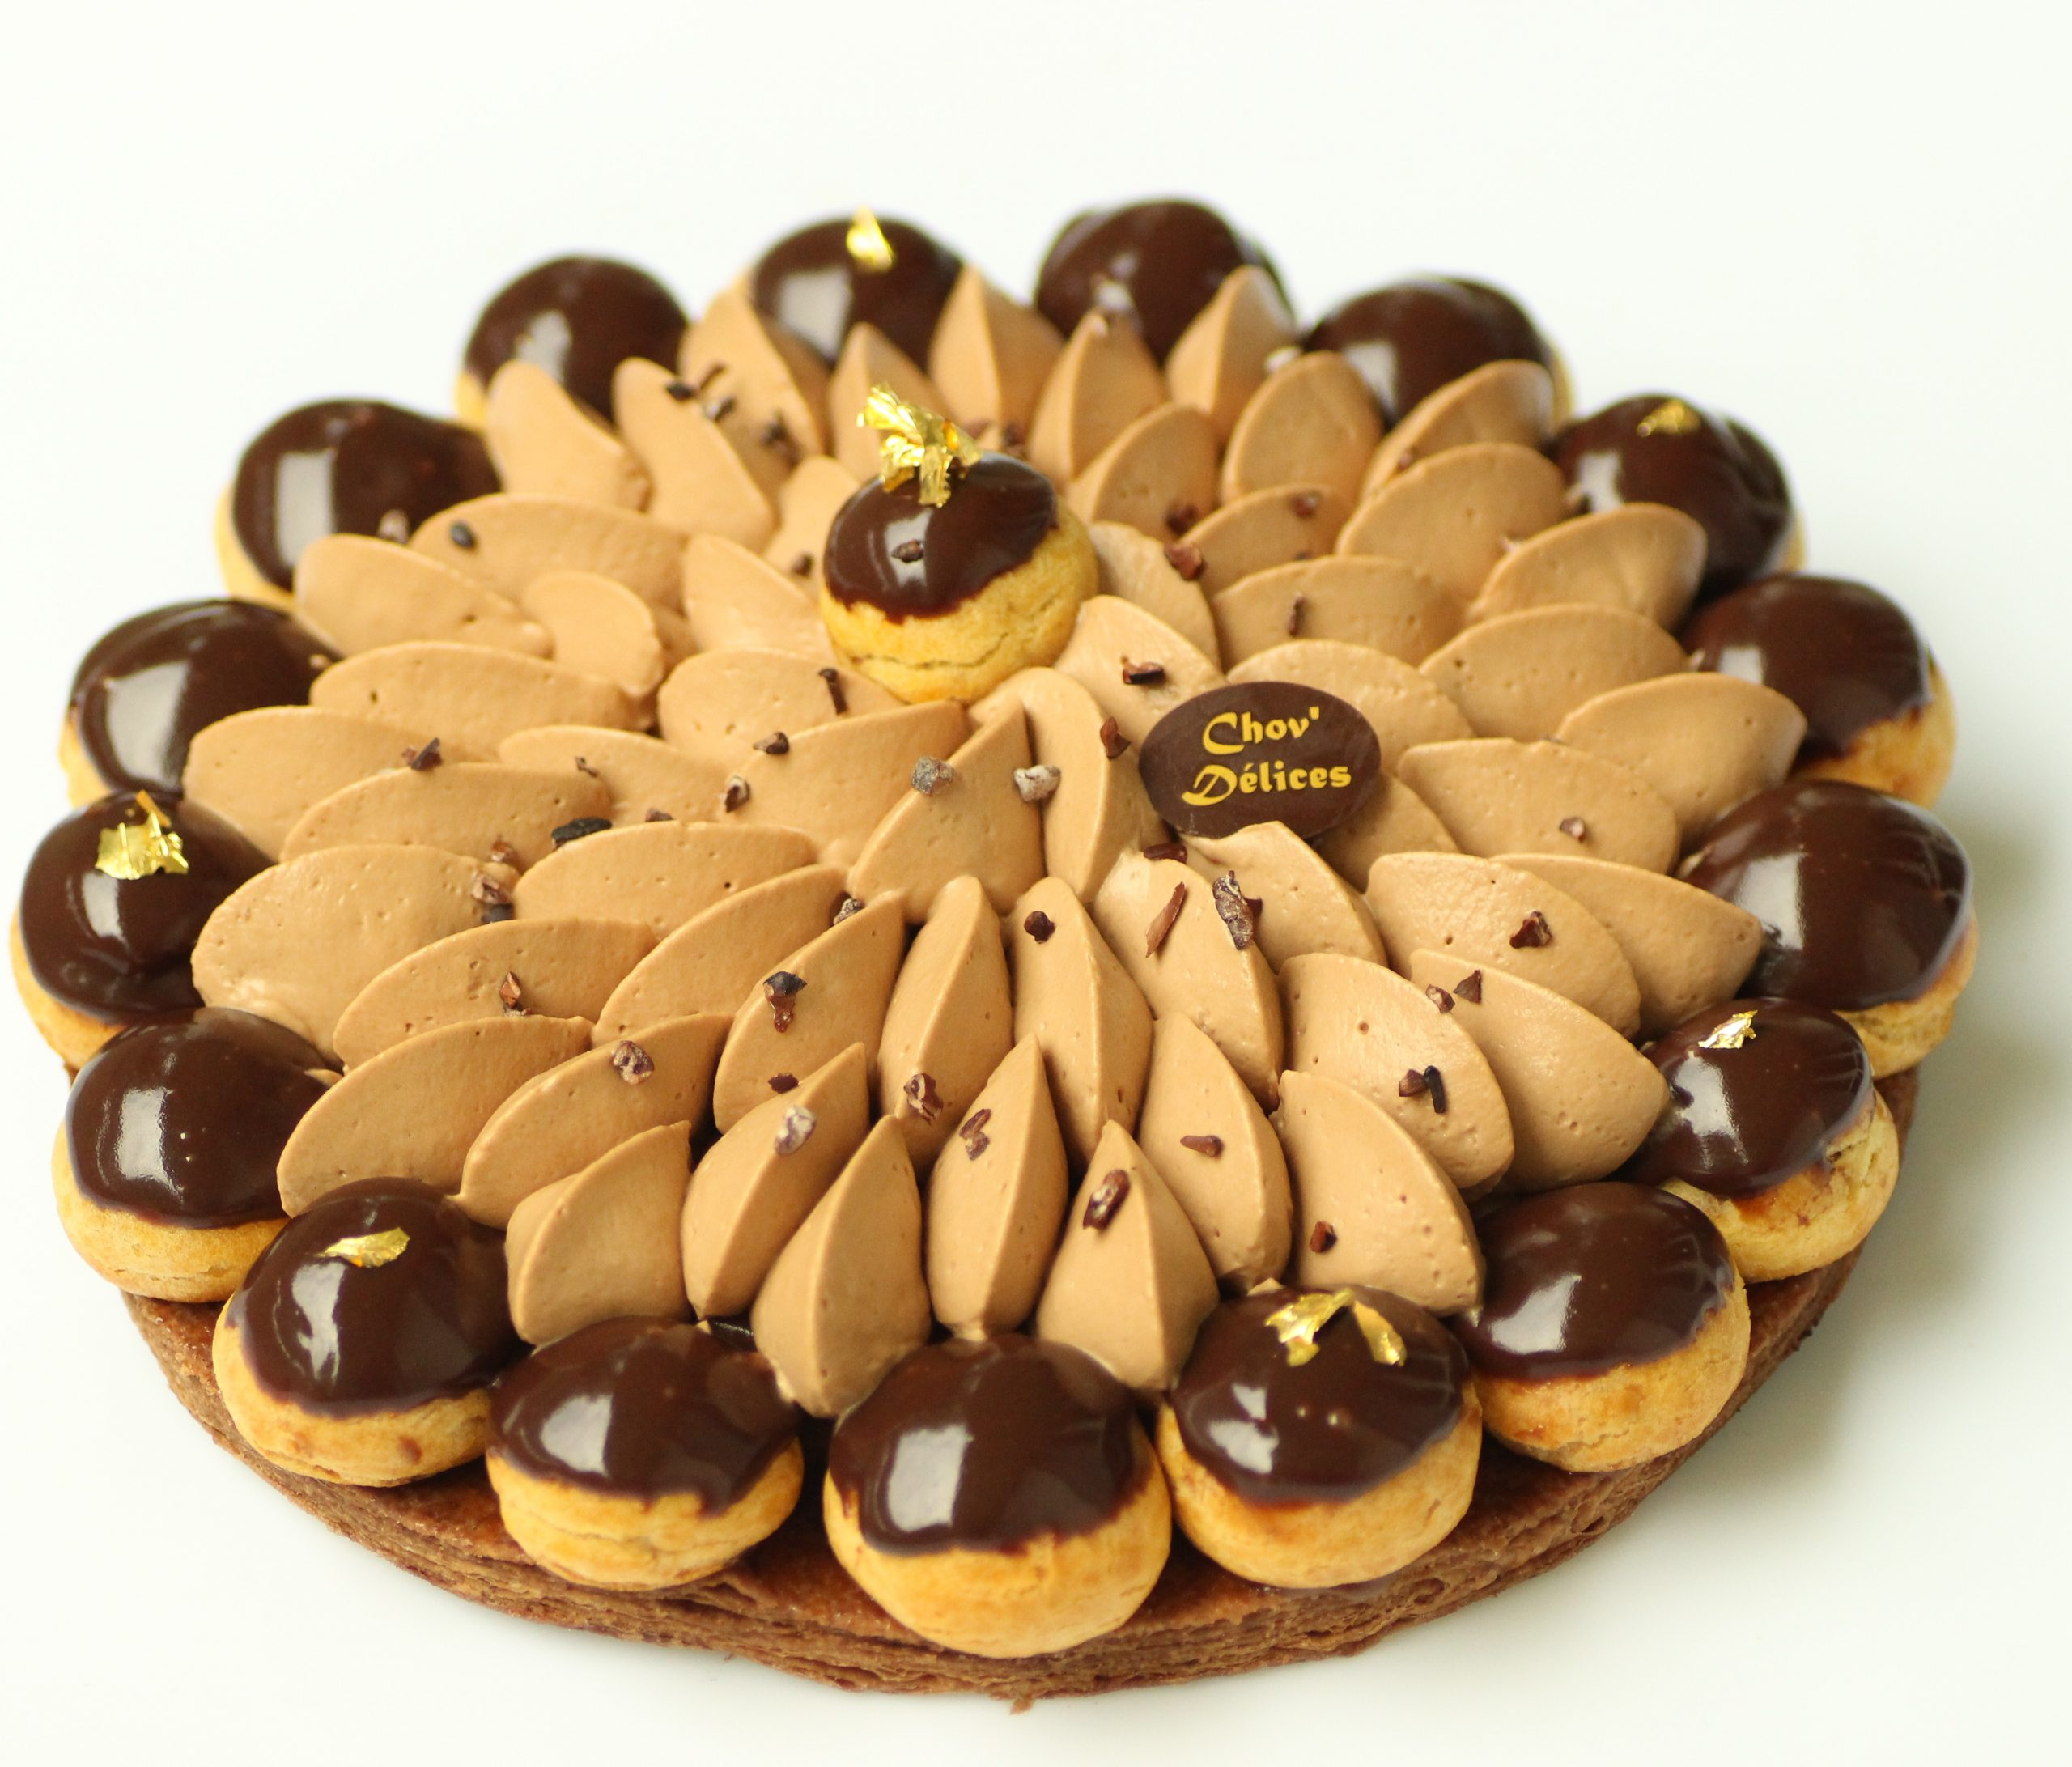 Saint Honoré Chocolat Tonka Chov Délices Pâtisserie Val D Oise